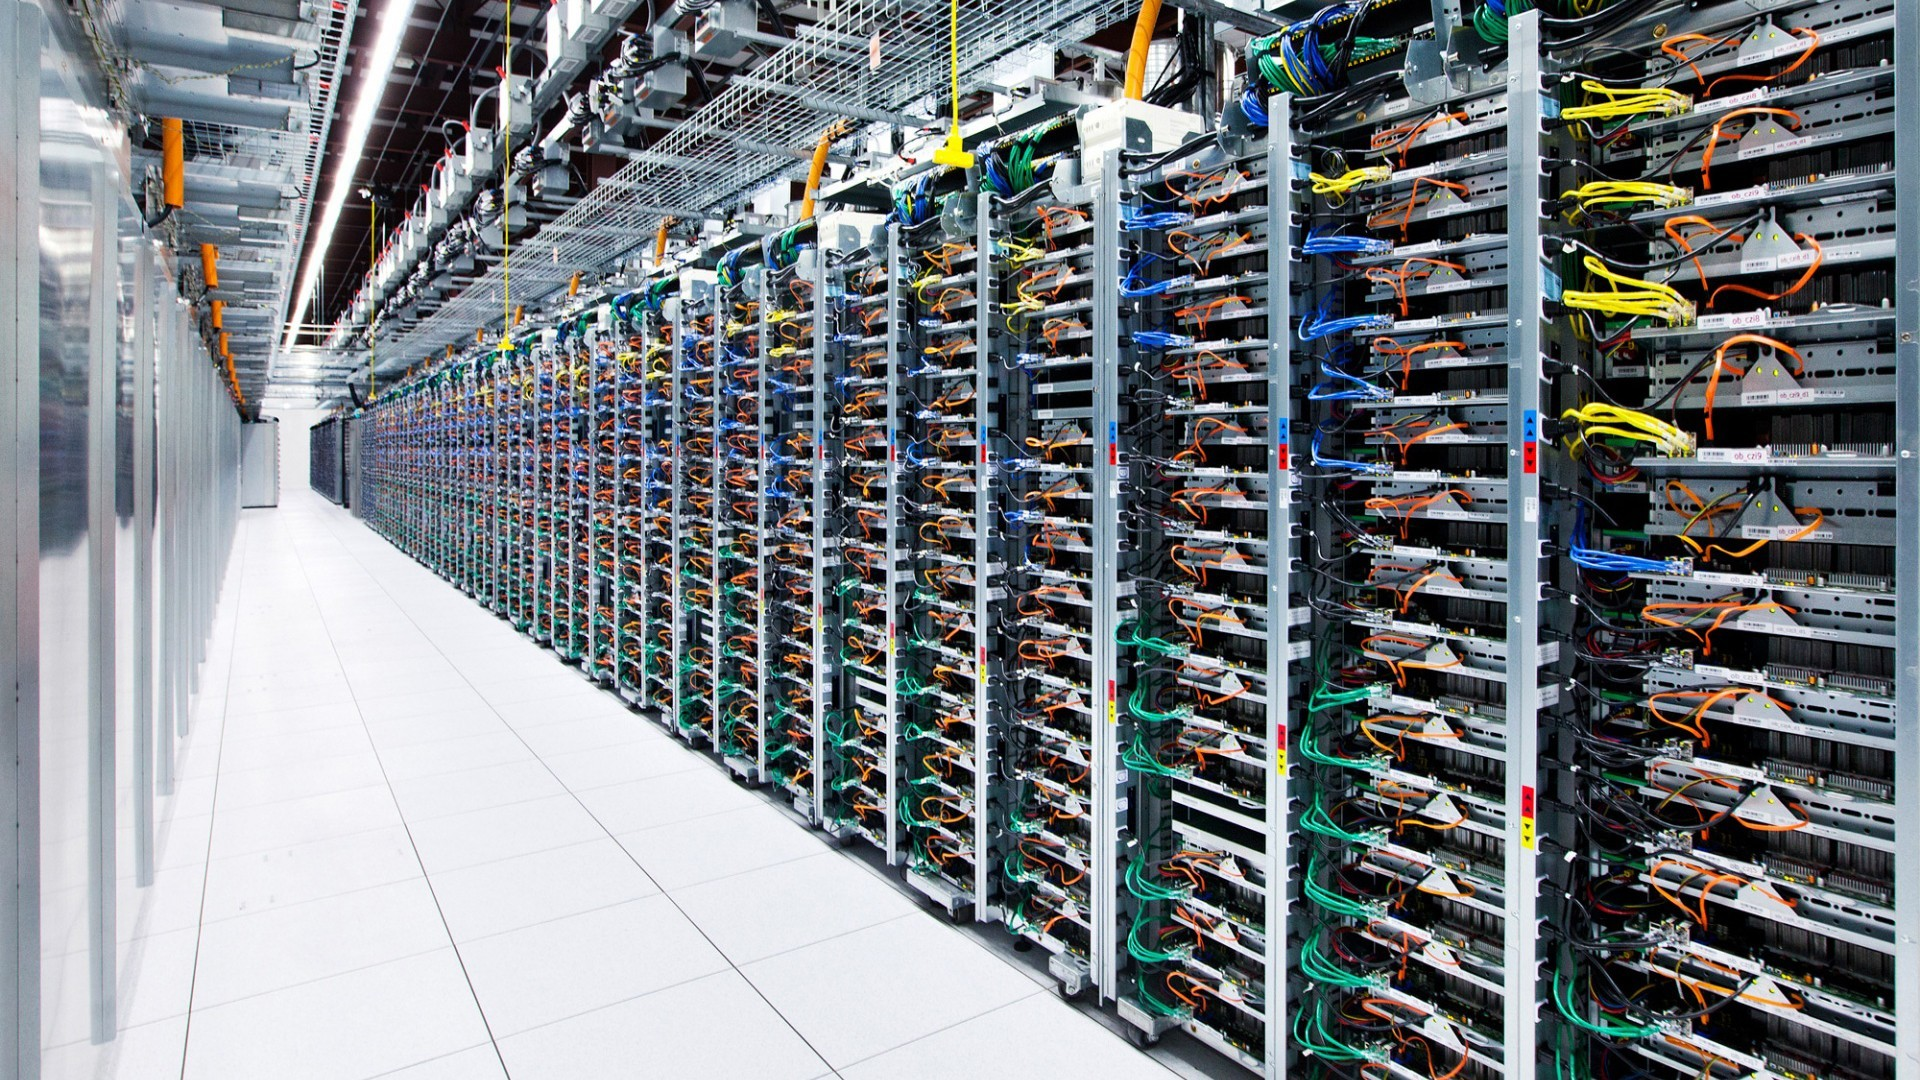 Google, Data Center, Network, Server, Computer